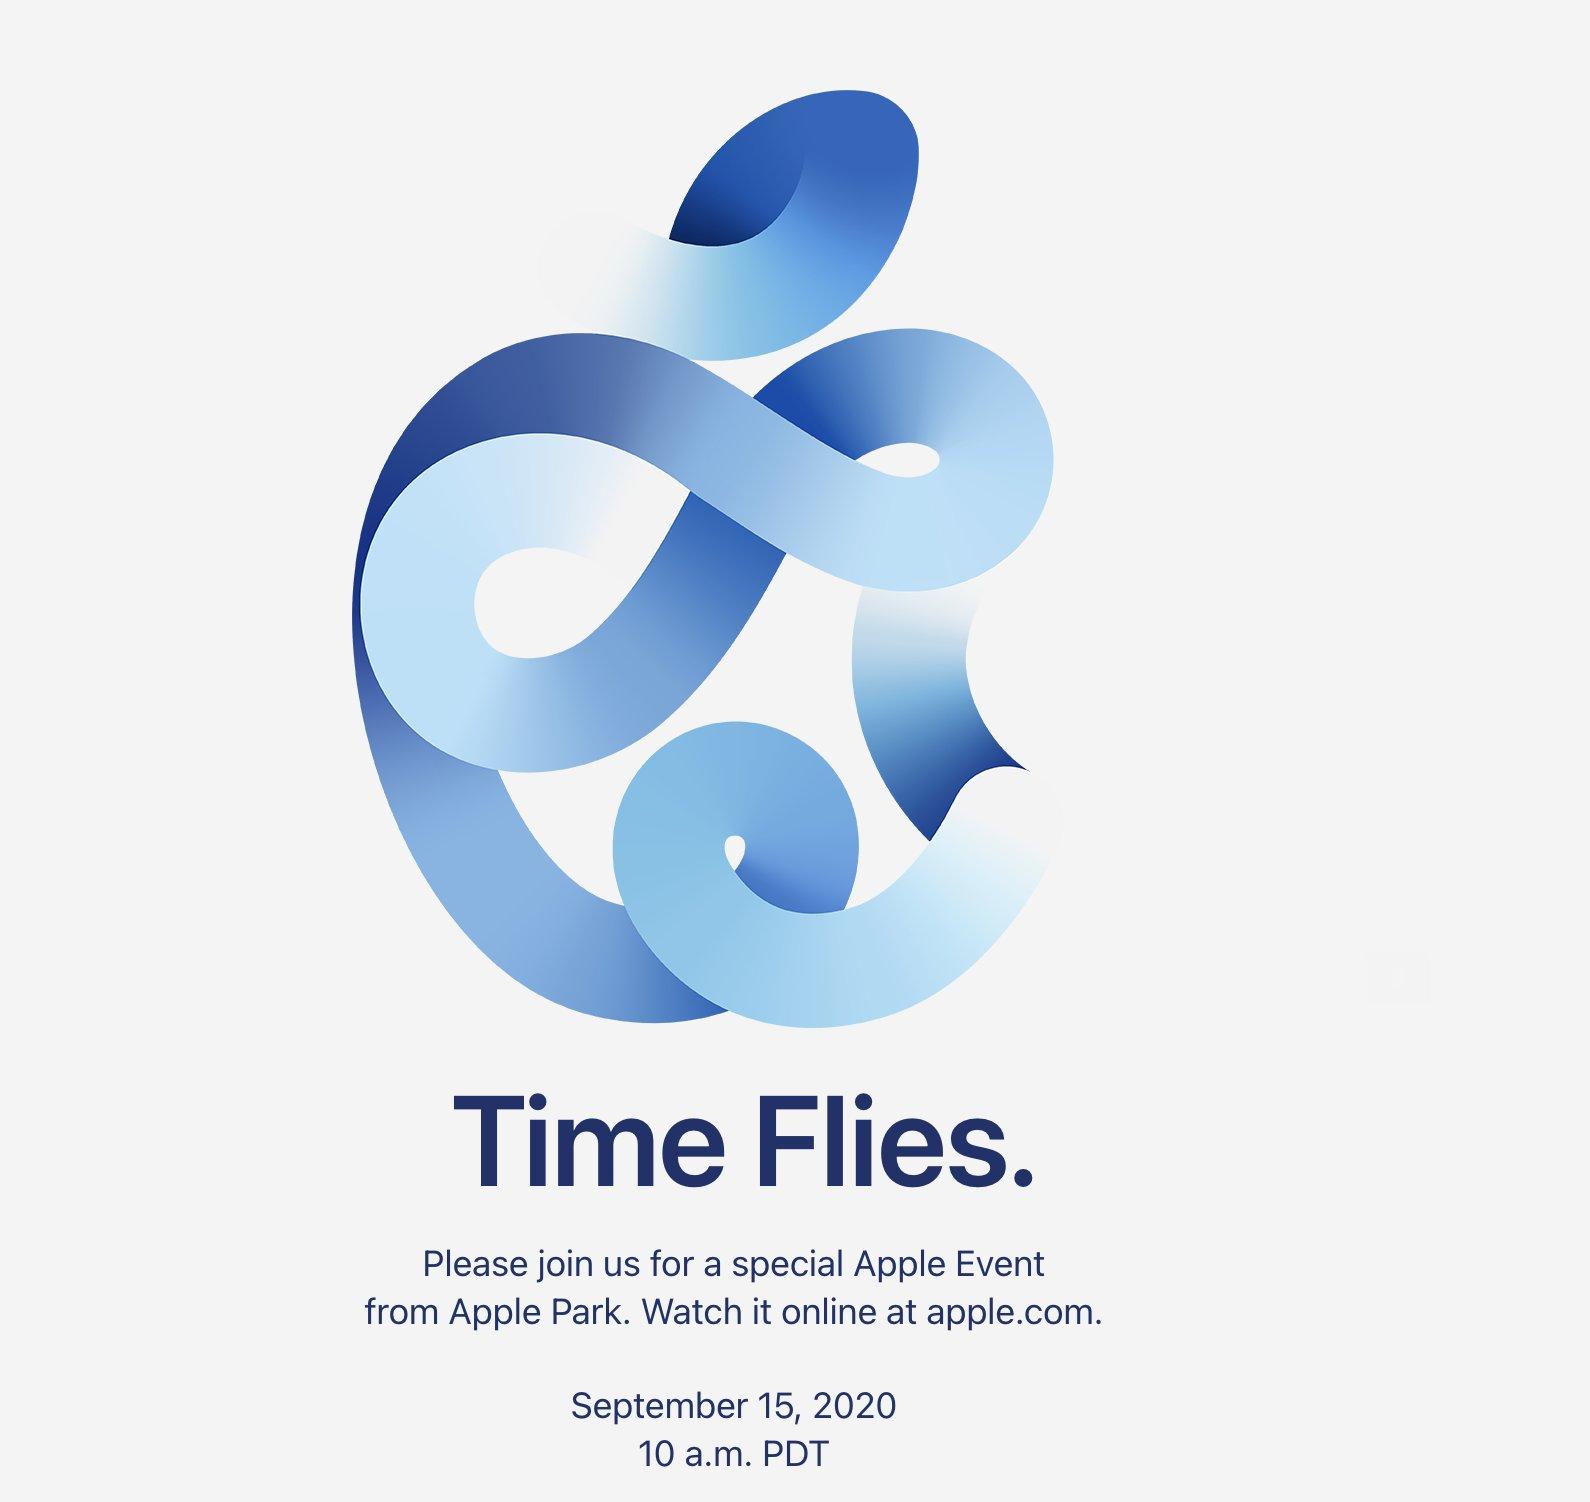 apple-event-sept-time-flies